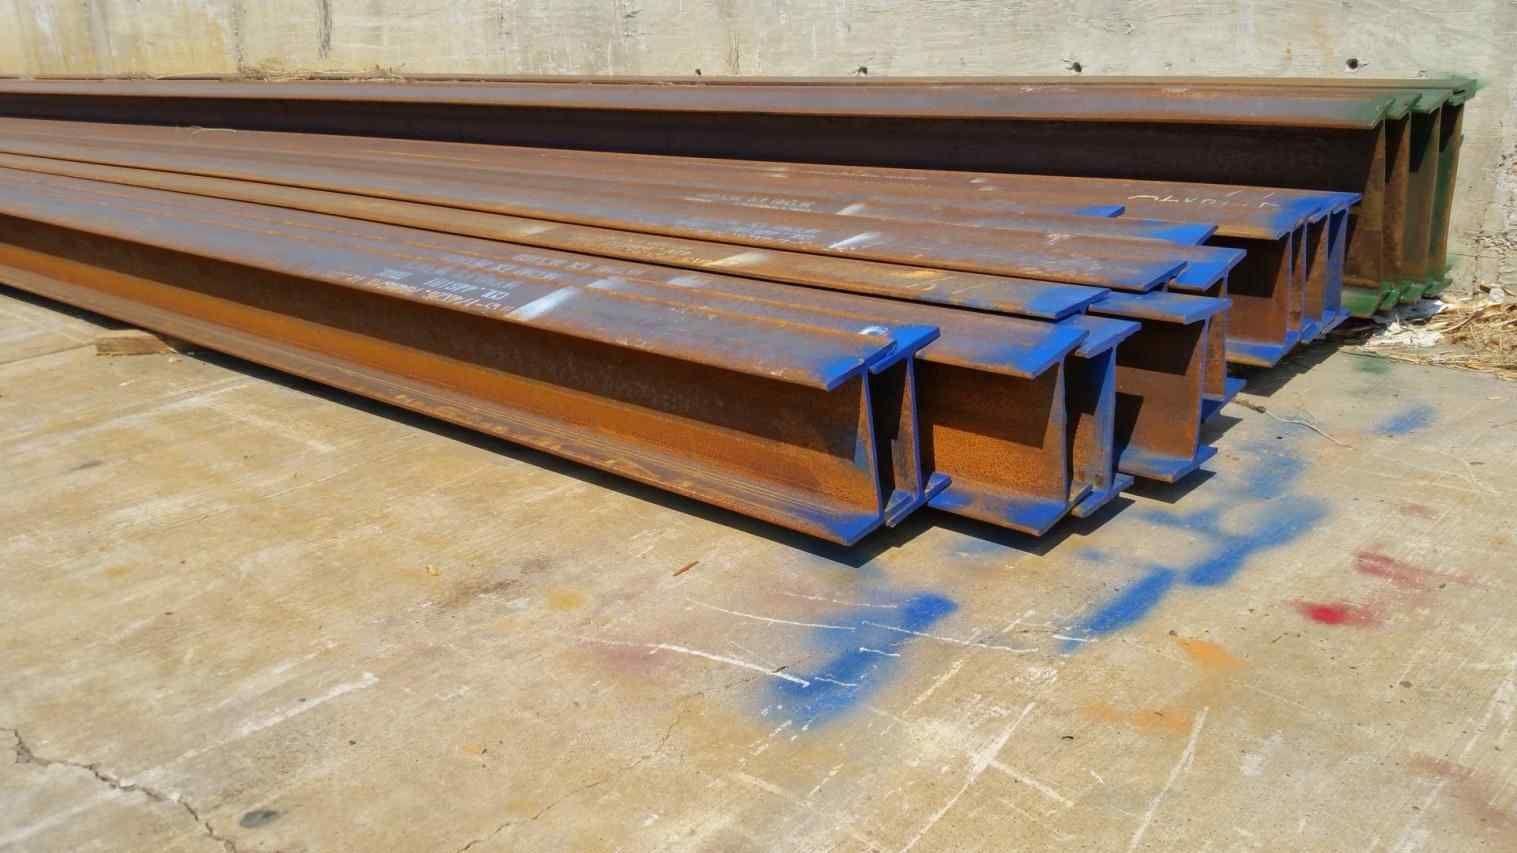 Metal Roofing Corpus Christi Roof design, Metal roof